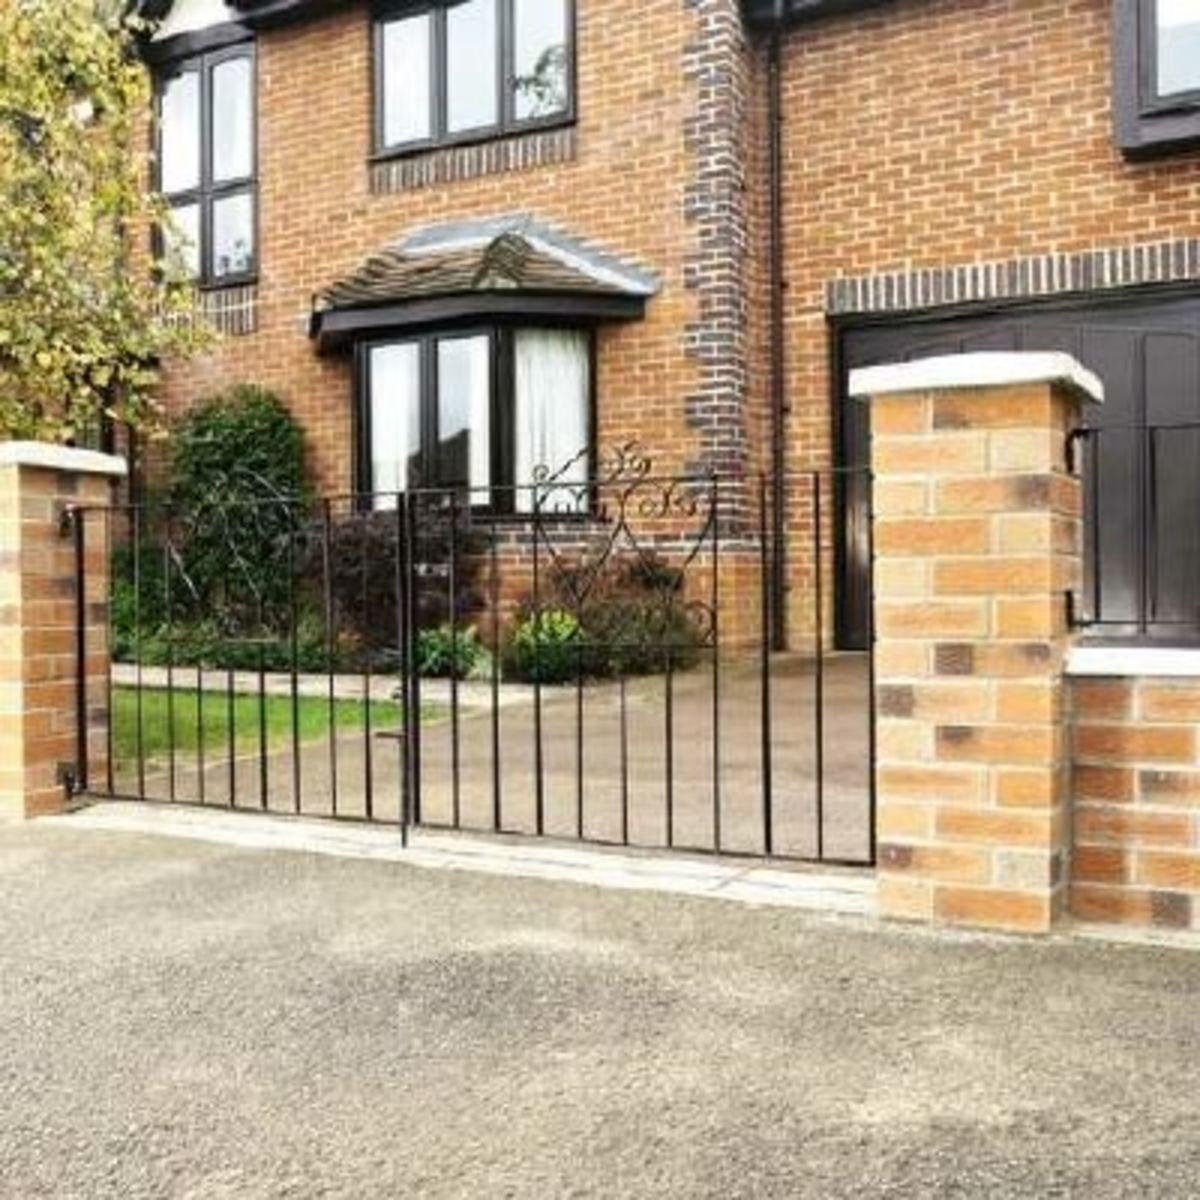 Wrought Iron gates - Iron driveway gates - Chelsea double gate